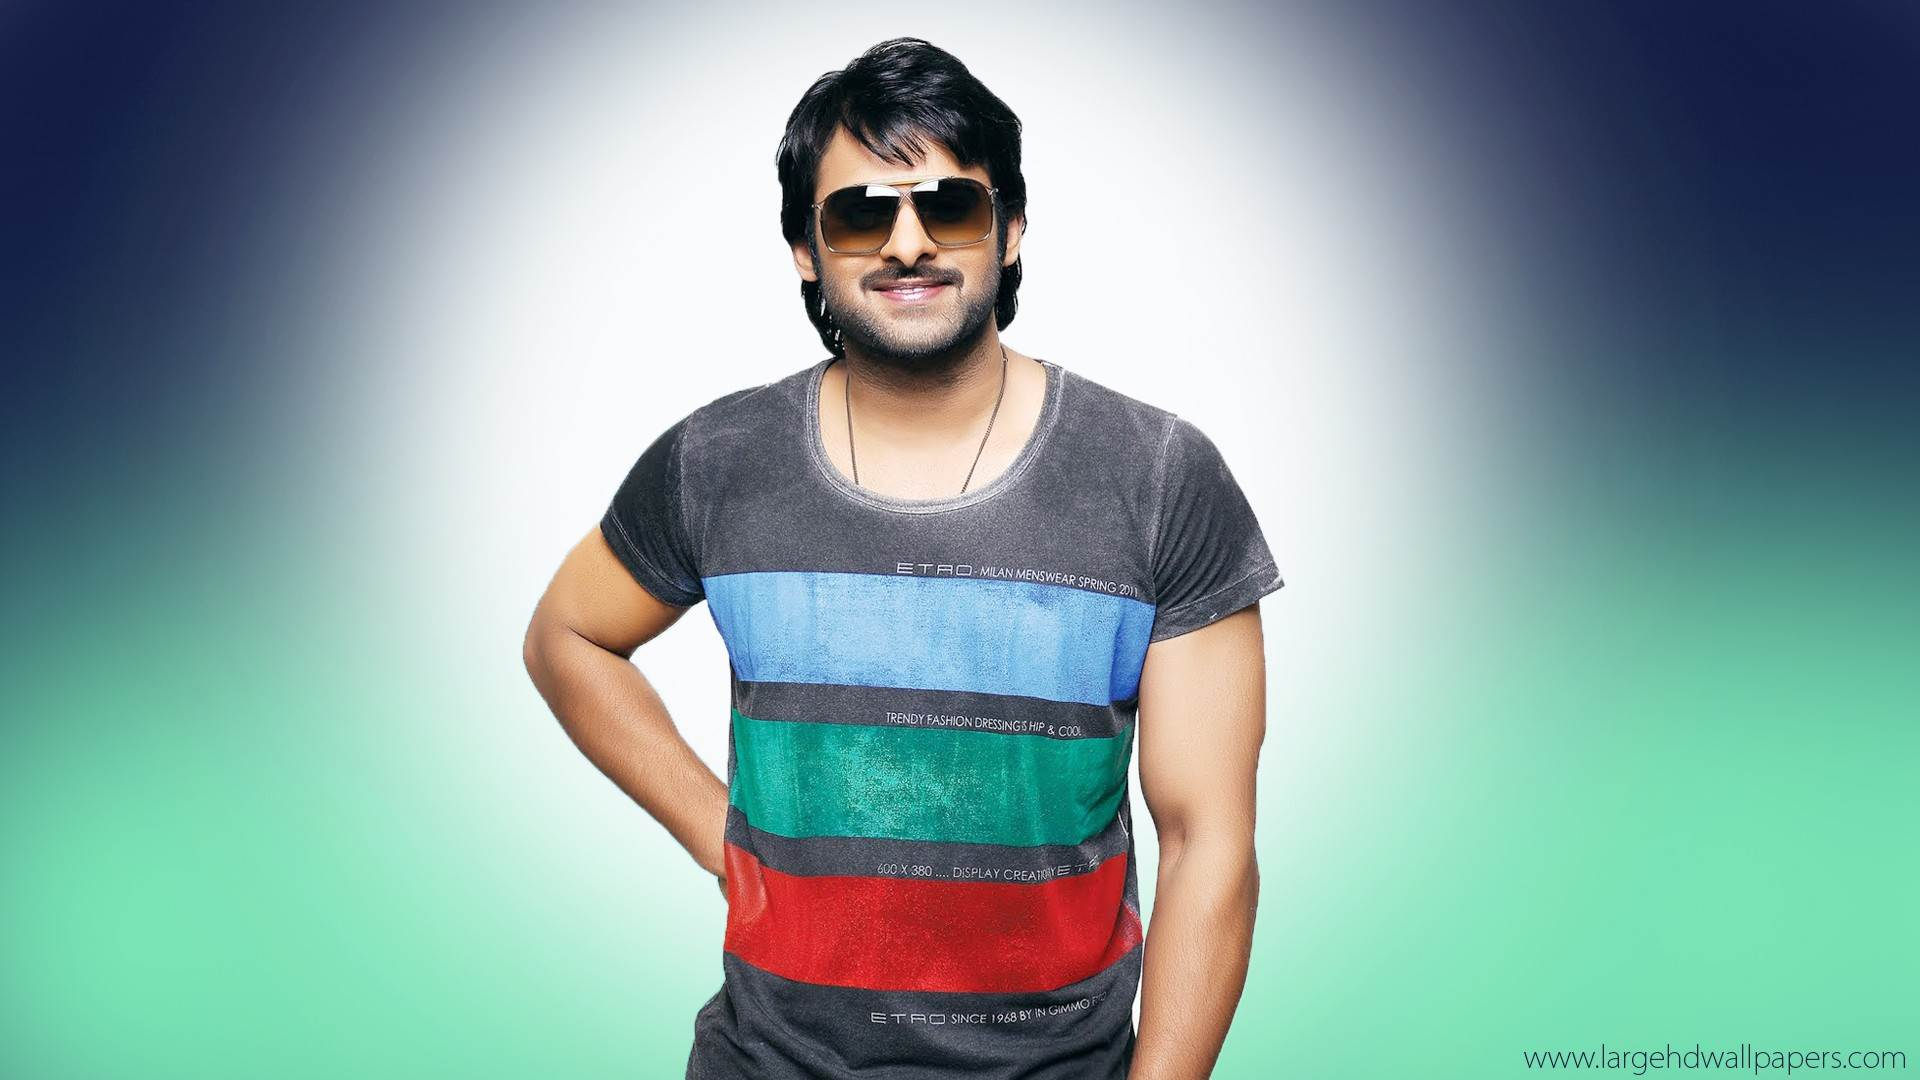 Prabhas Hd Wallpapers Download Telugu Actor Prabhas: Telugu Actors HD Wallpapers (53 Wallpapers)